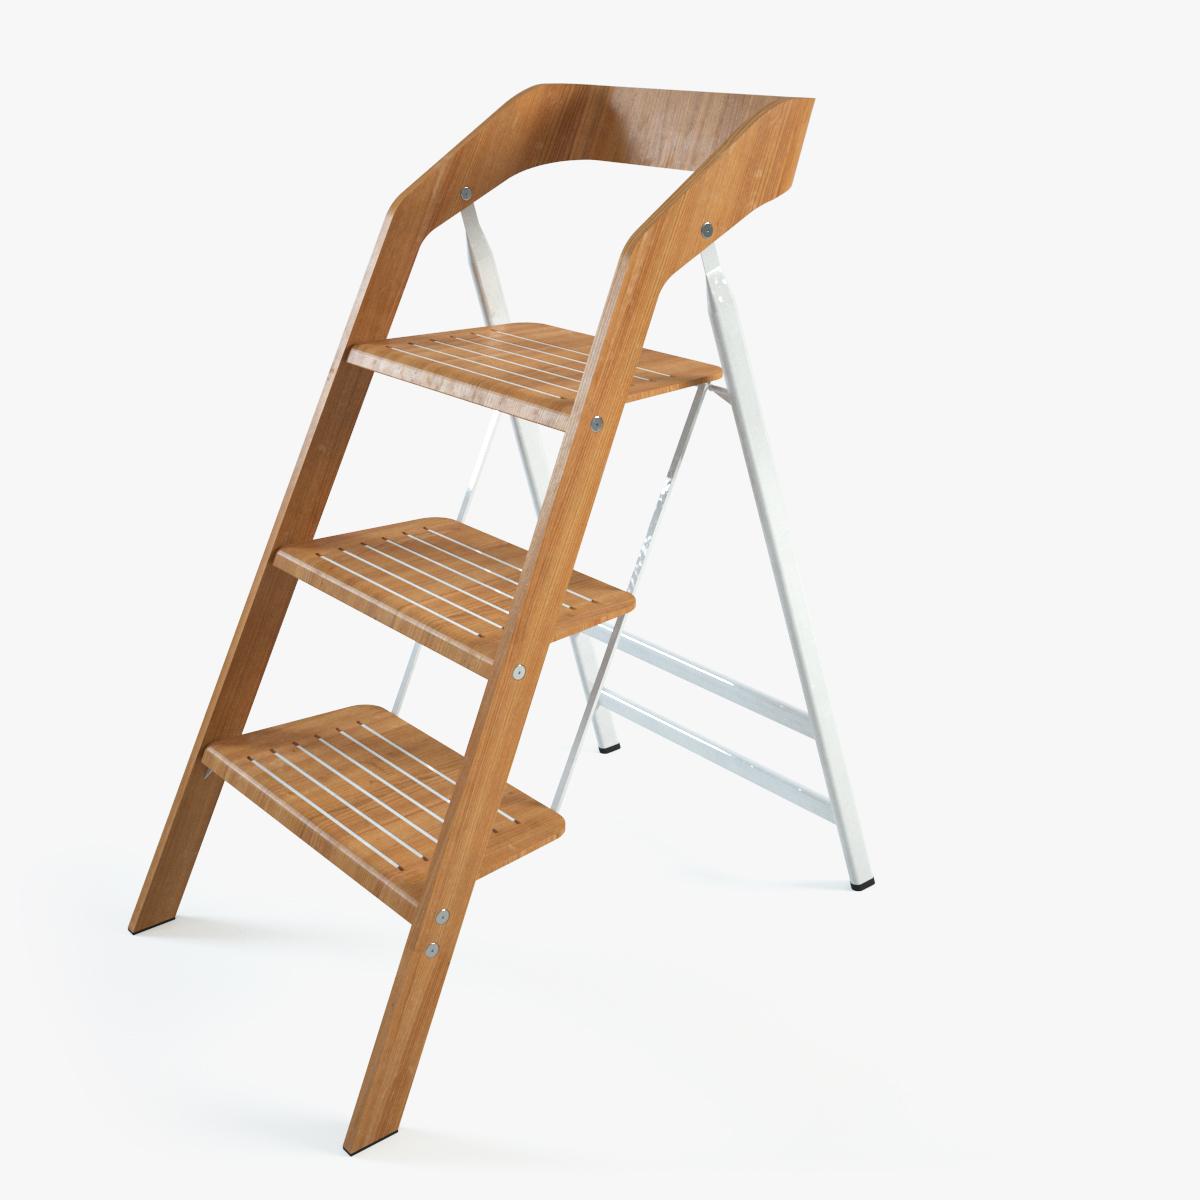 Vintage Usit Stepladder Chair 3 Step Version 3d Model Max 1